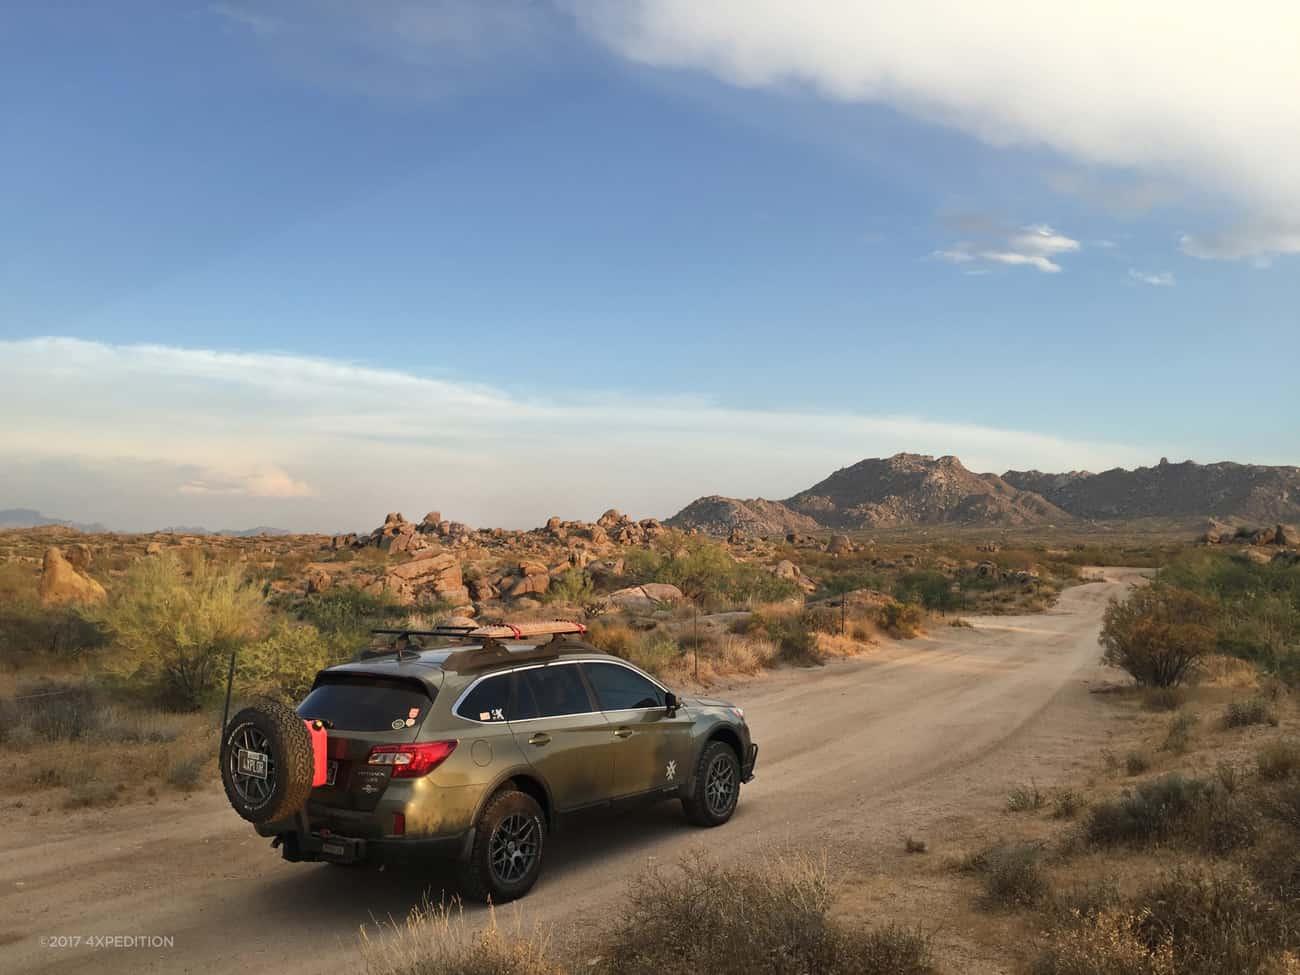 Backcountry Camper Trailer